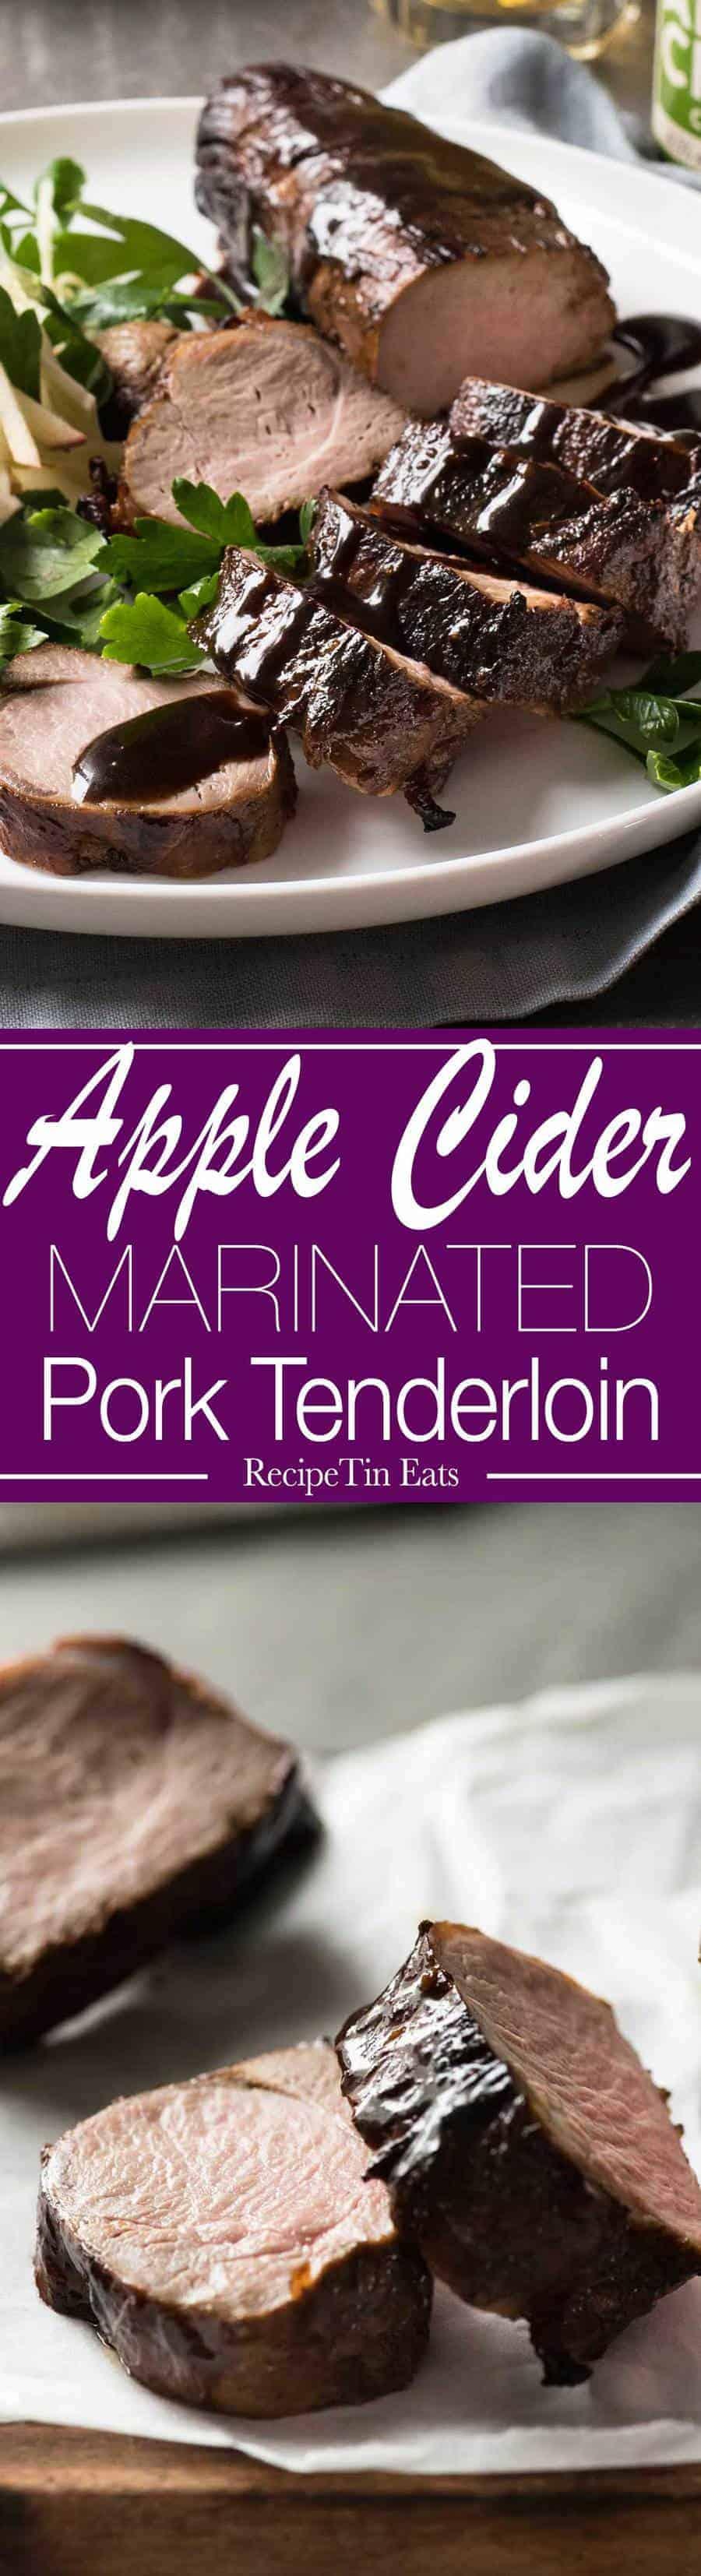 Apple Cider Marinated Pork Tenderloin   This is amazing! The apple cider really tenderises the pork!! LOVE the glaze